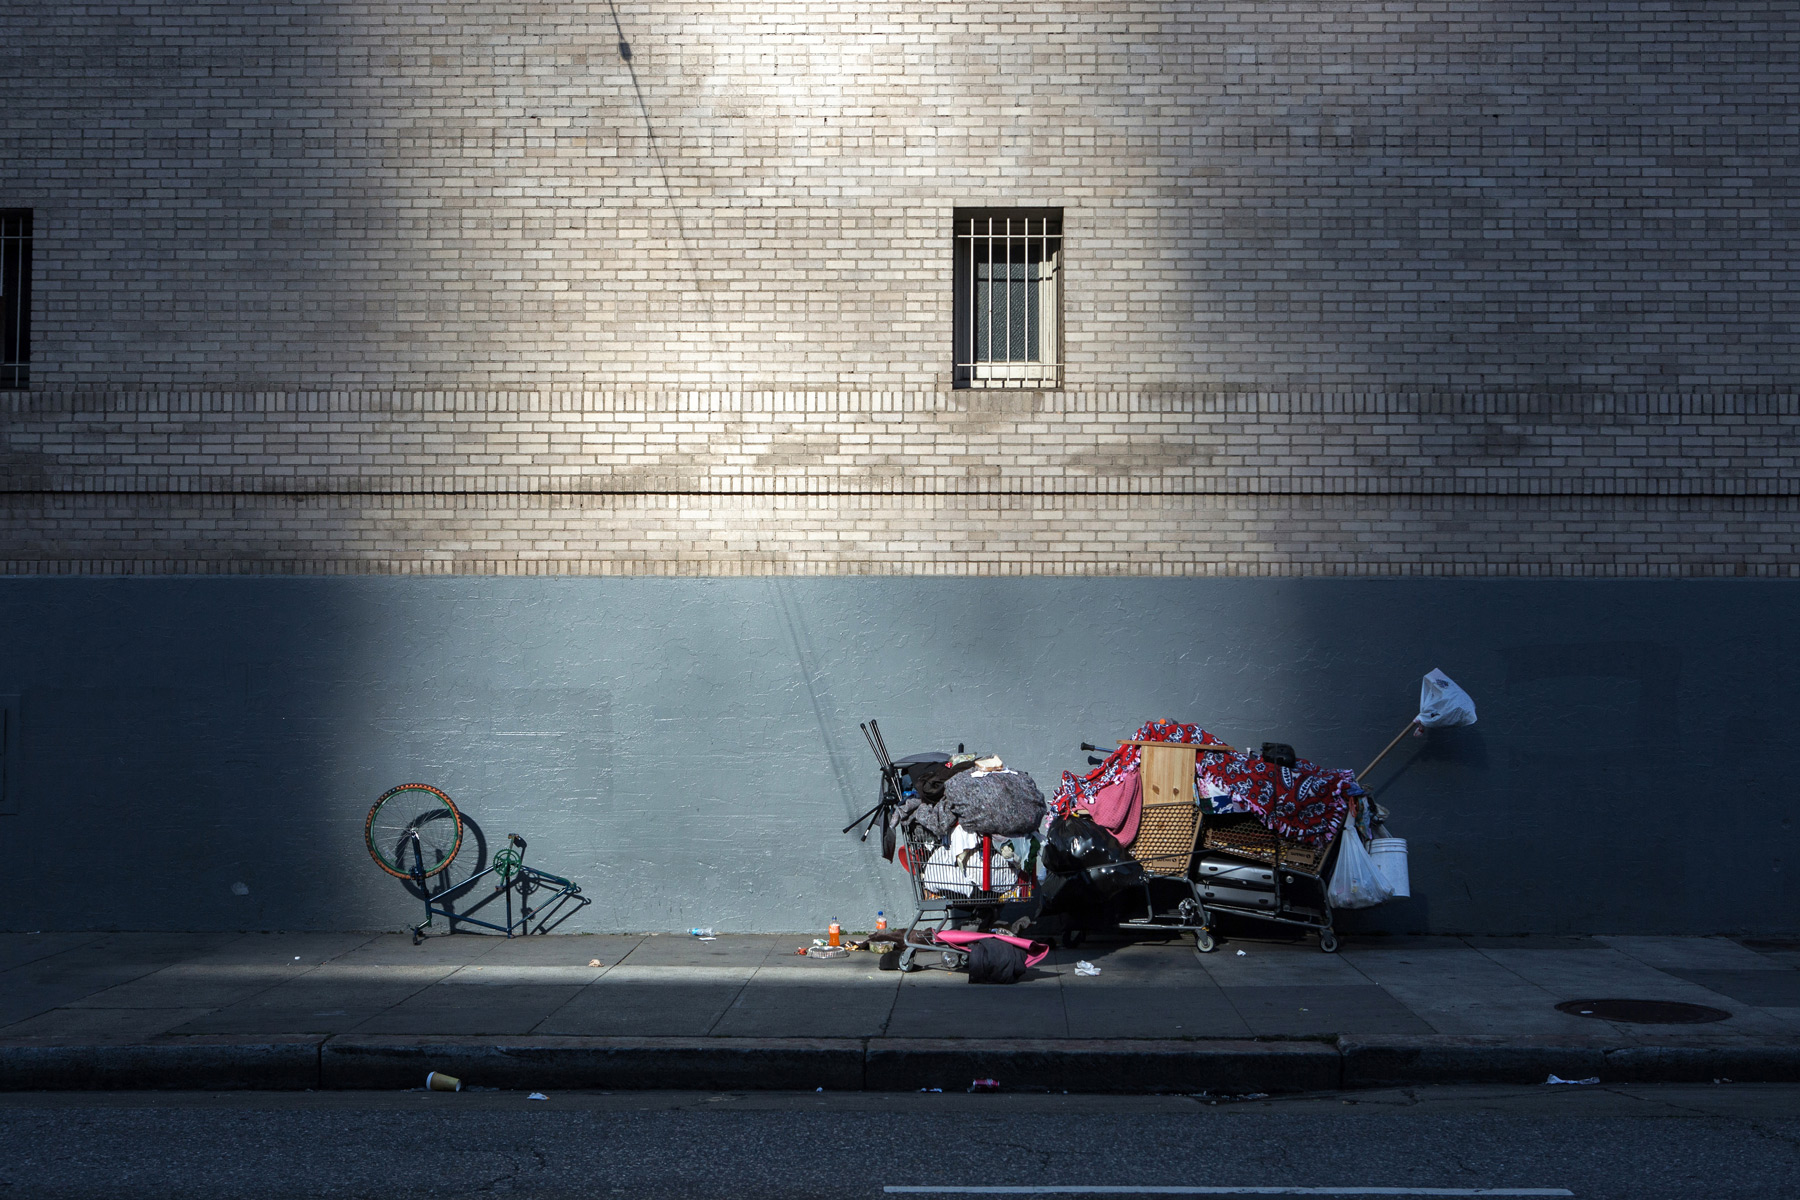 A person's belongings on the sidewalk, San Francisco